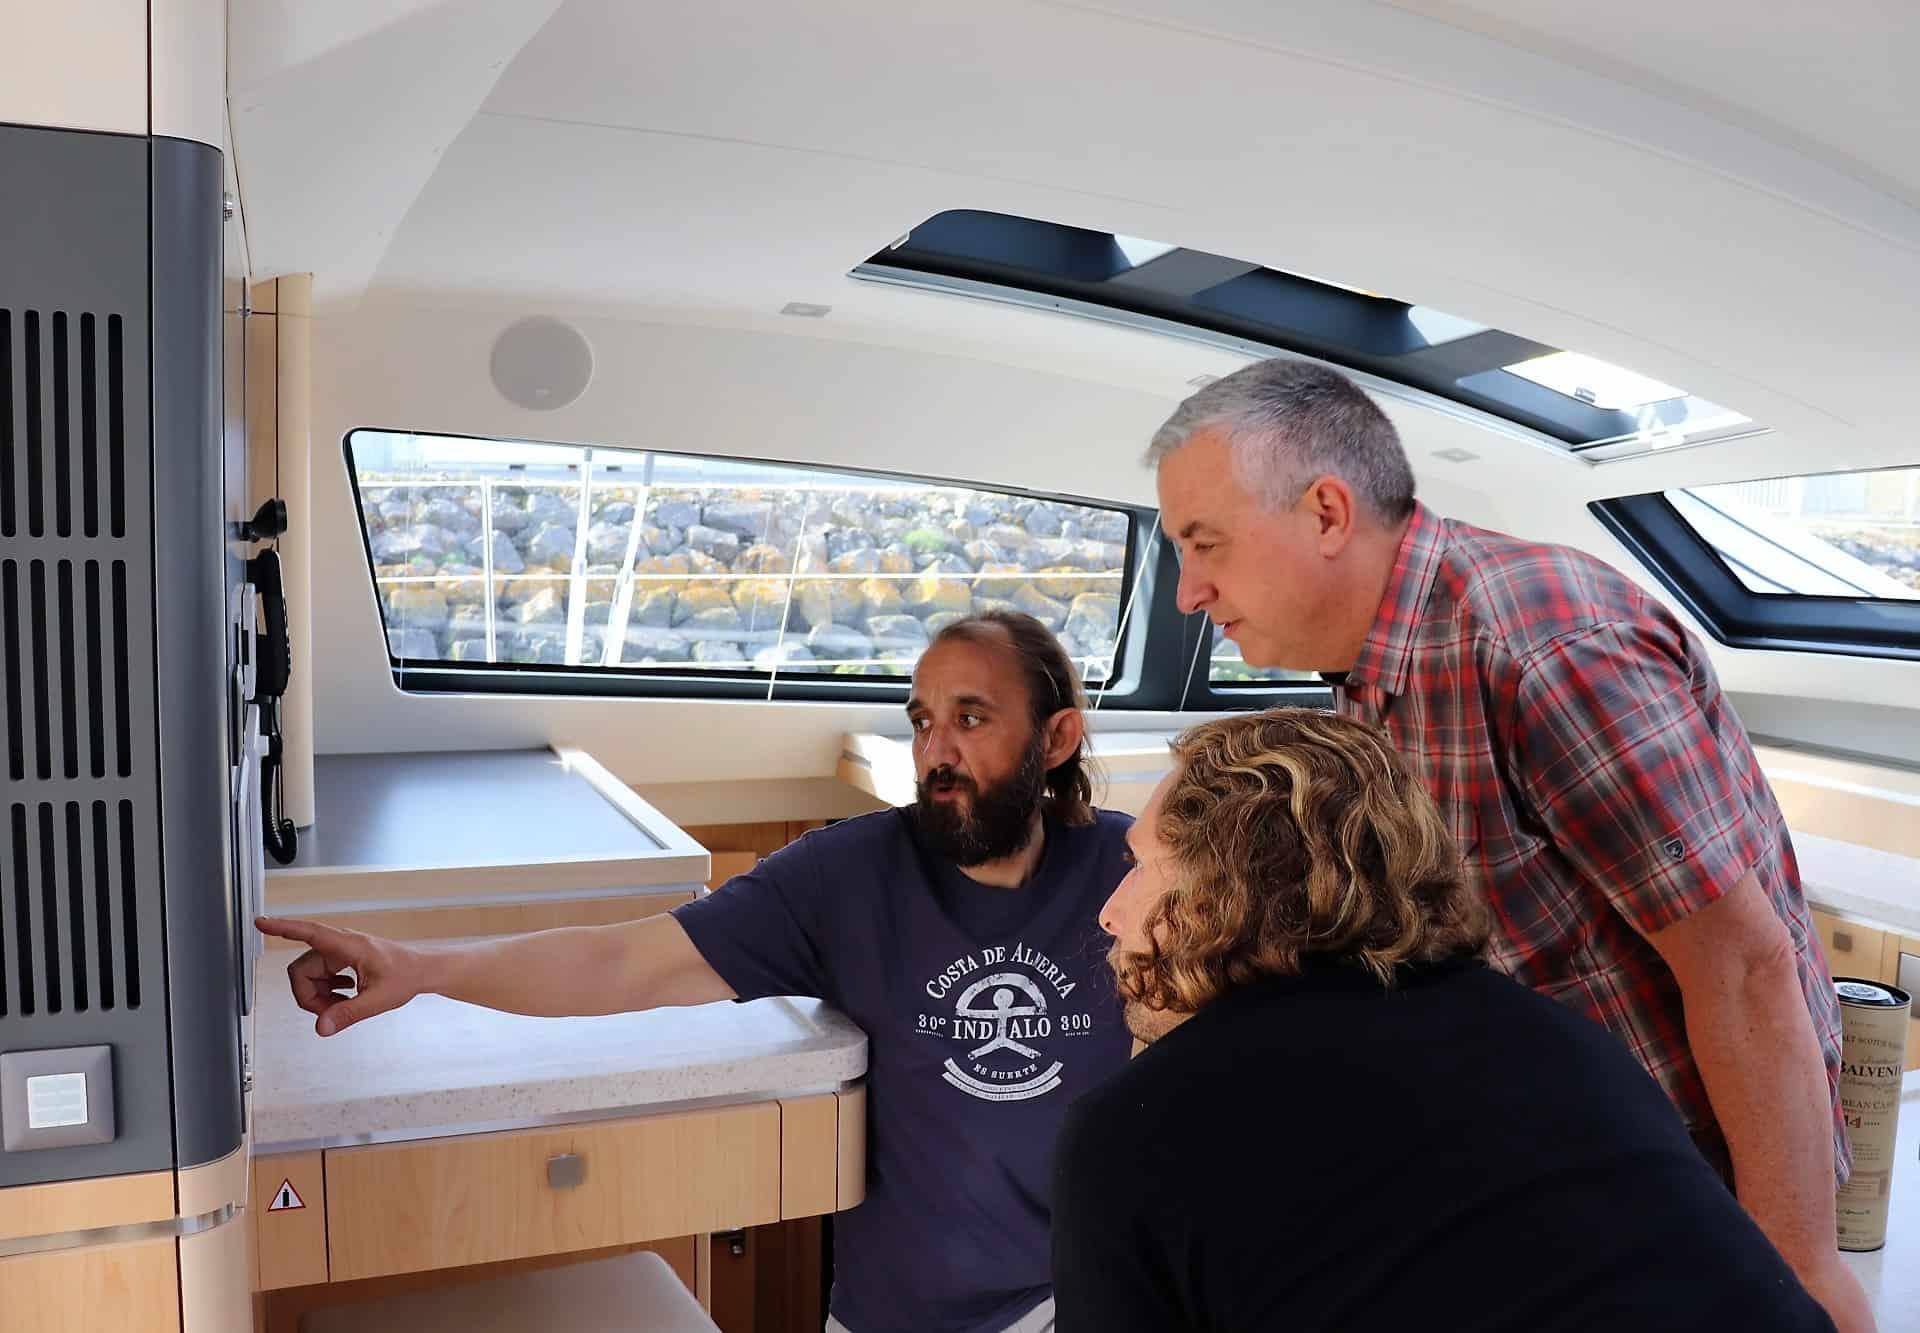 Xavier teaching on board systems